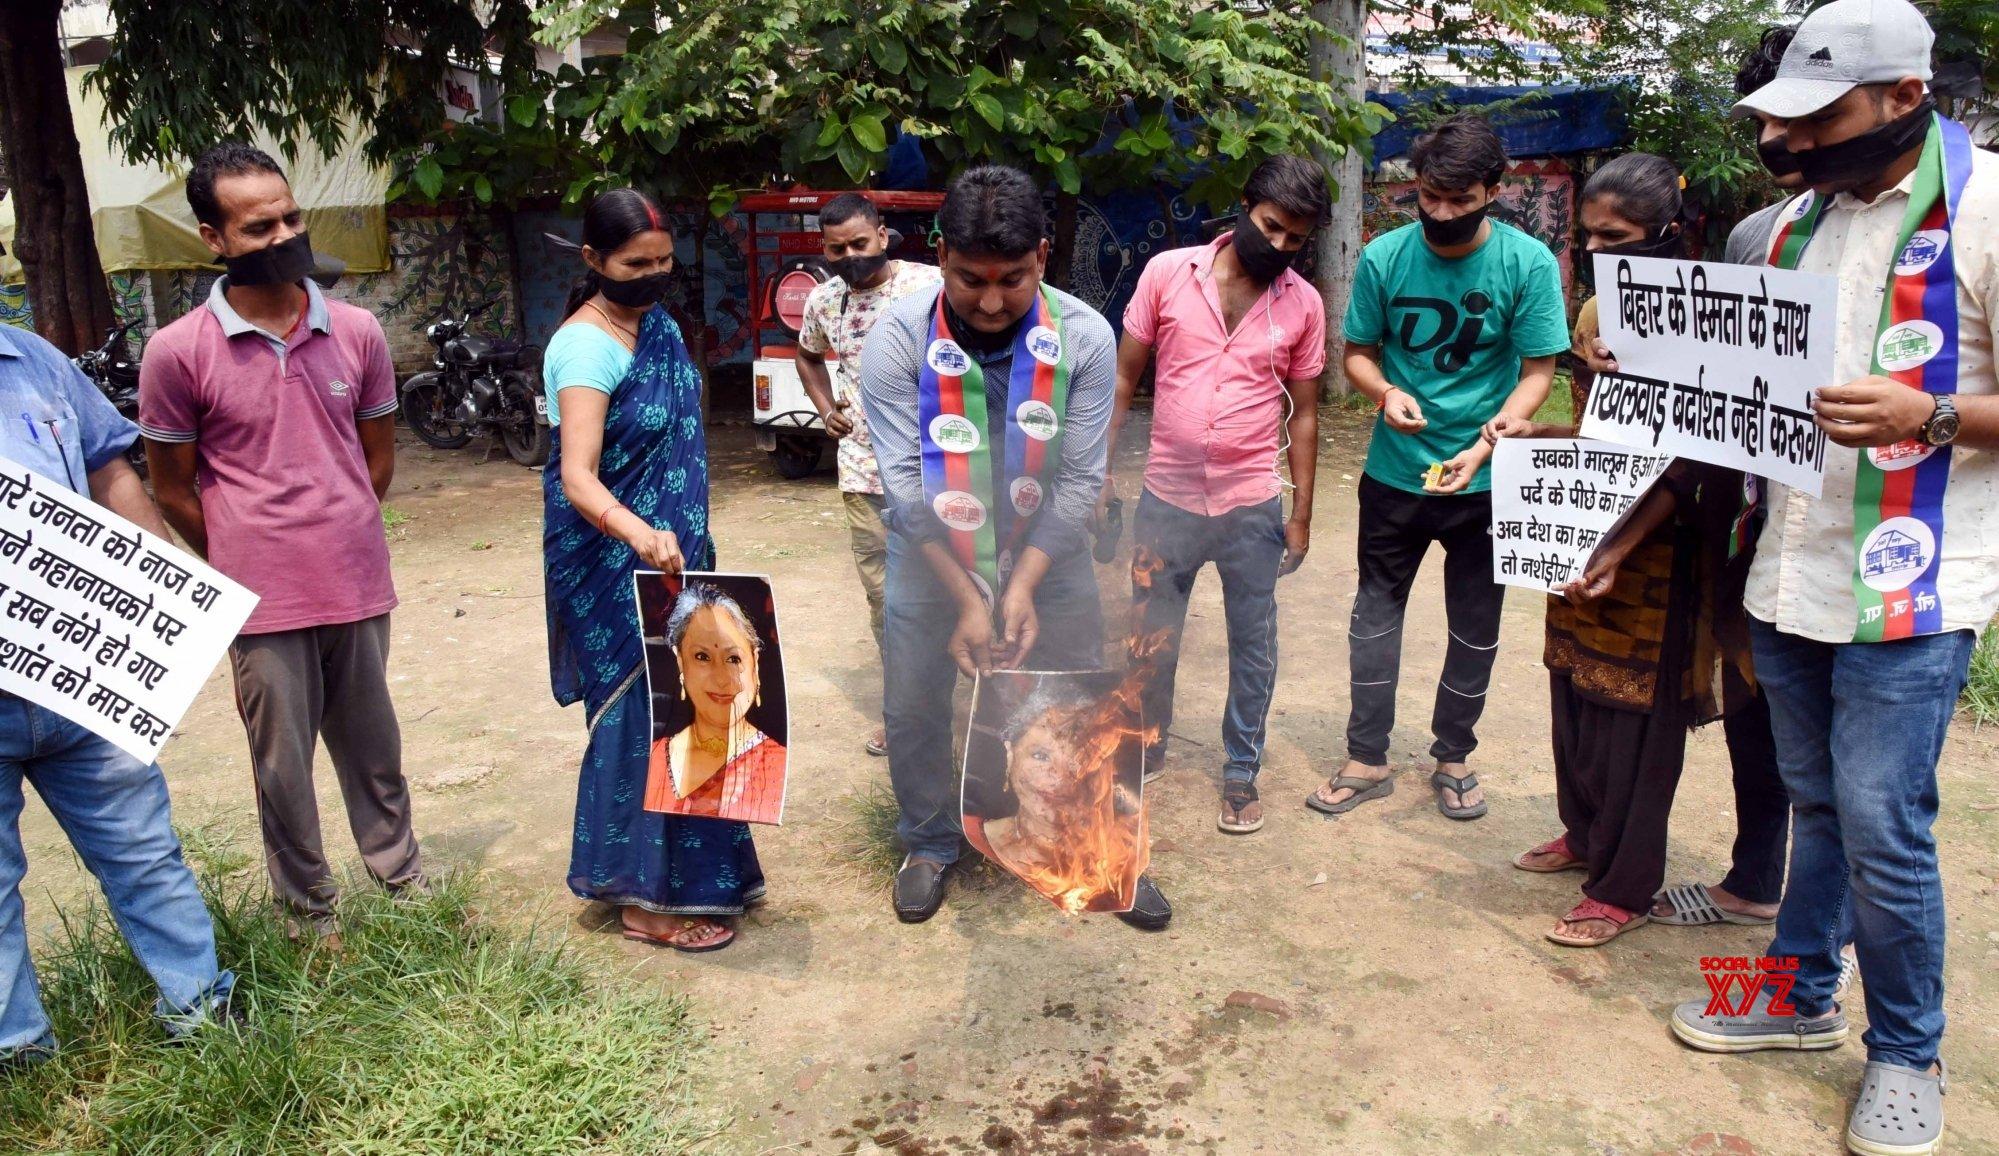 Patna: LJP protests against Jaya Bachchan after her Parliament speech alleging B'wood being defamed #Gallery